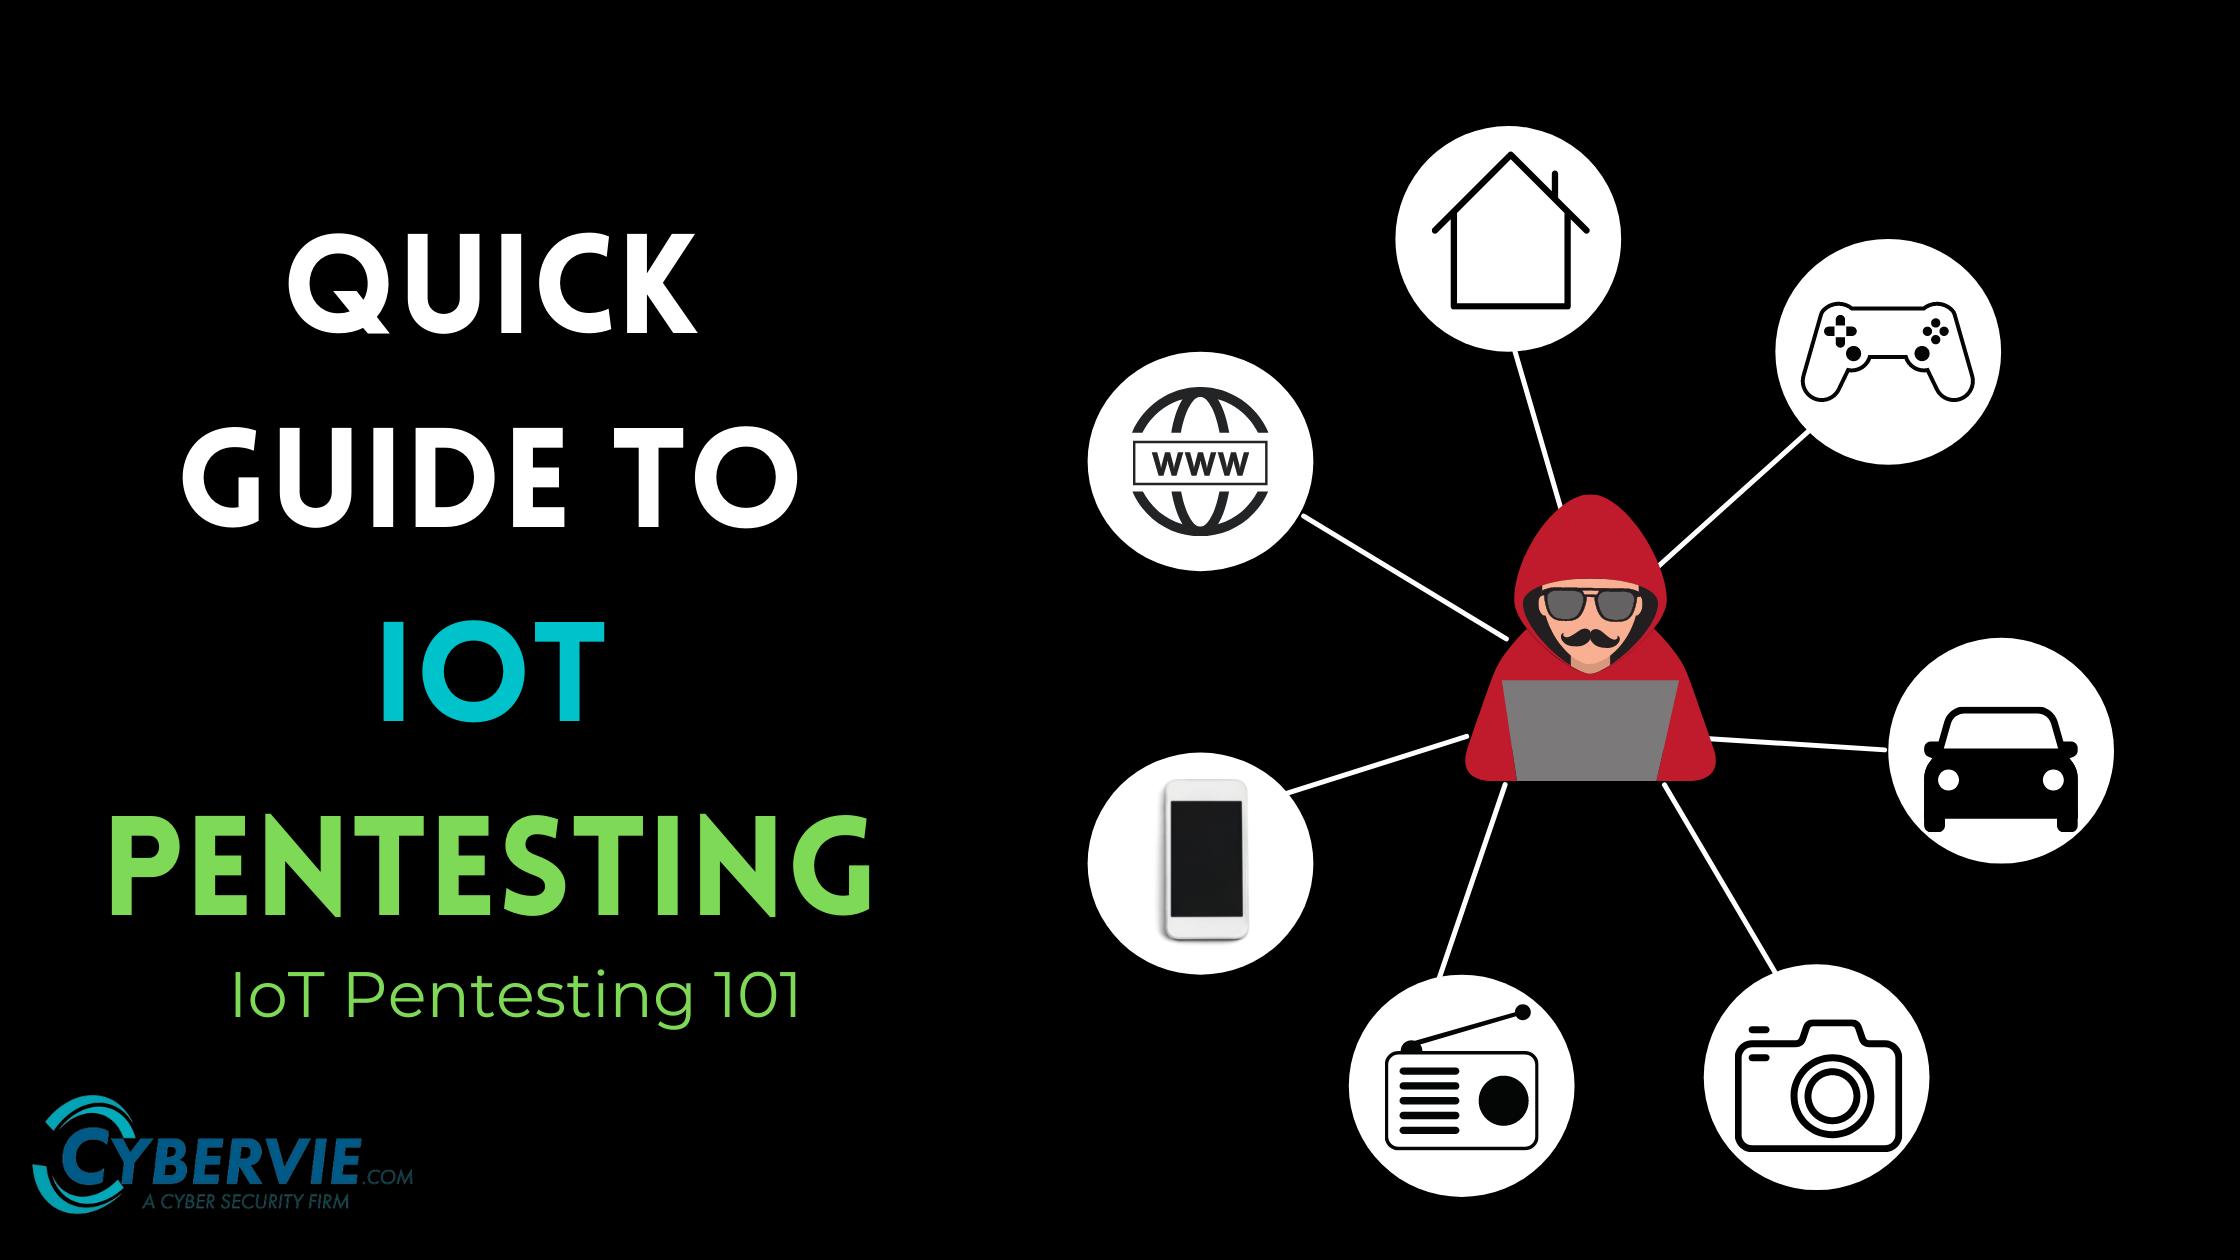 IoT pentesting